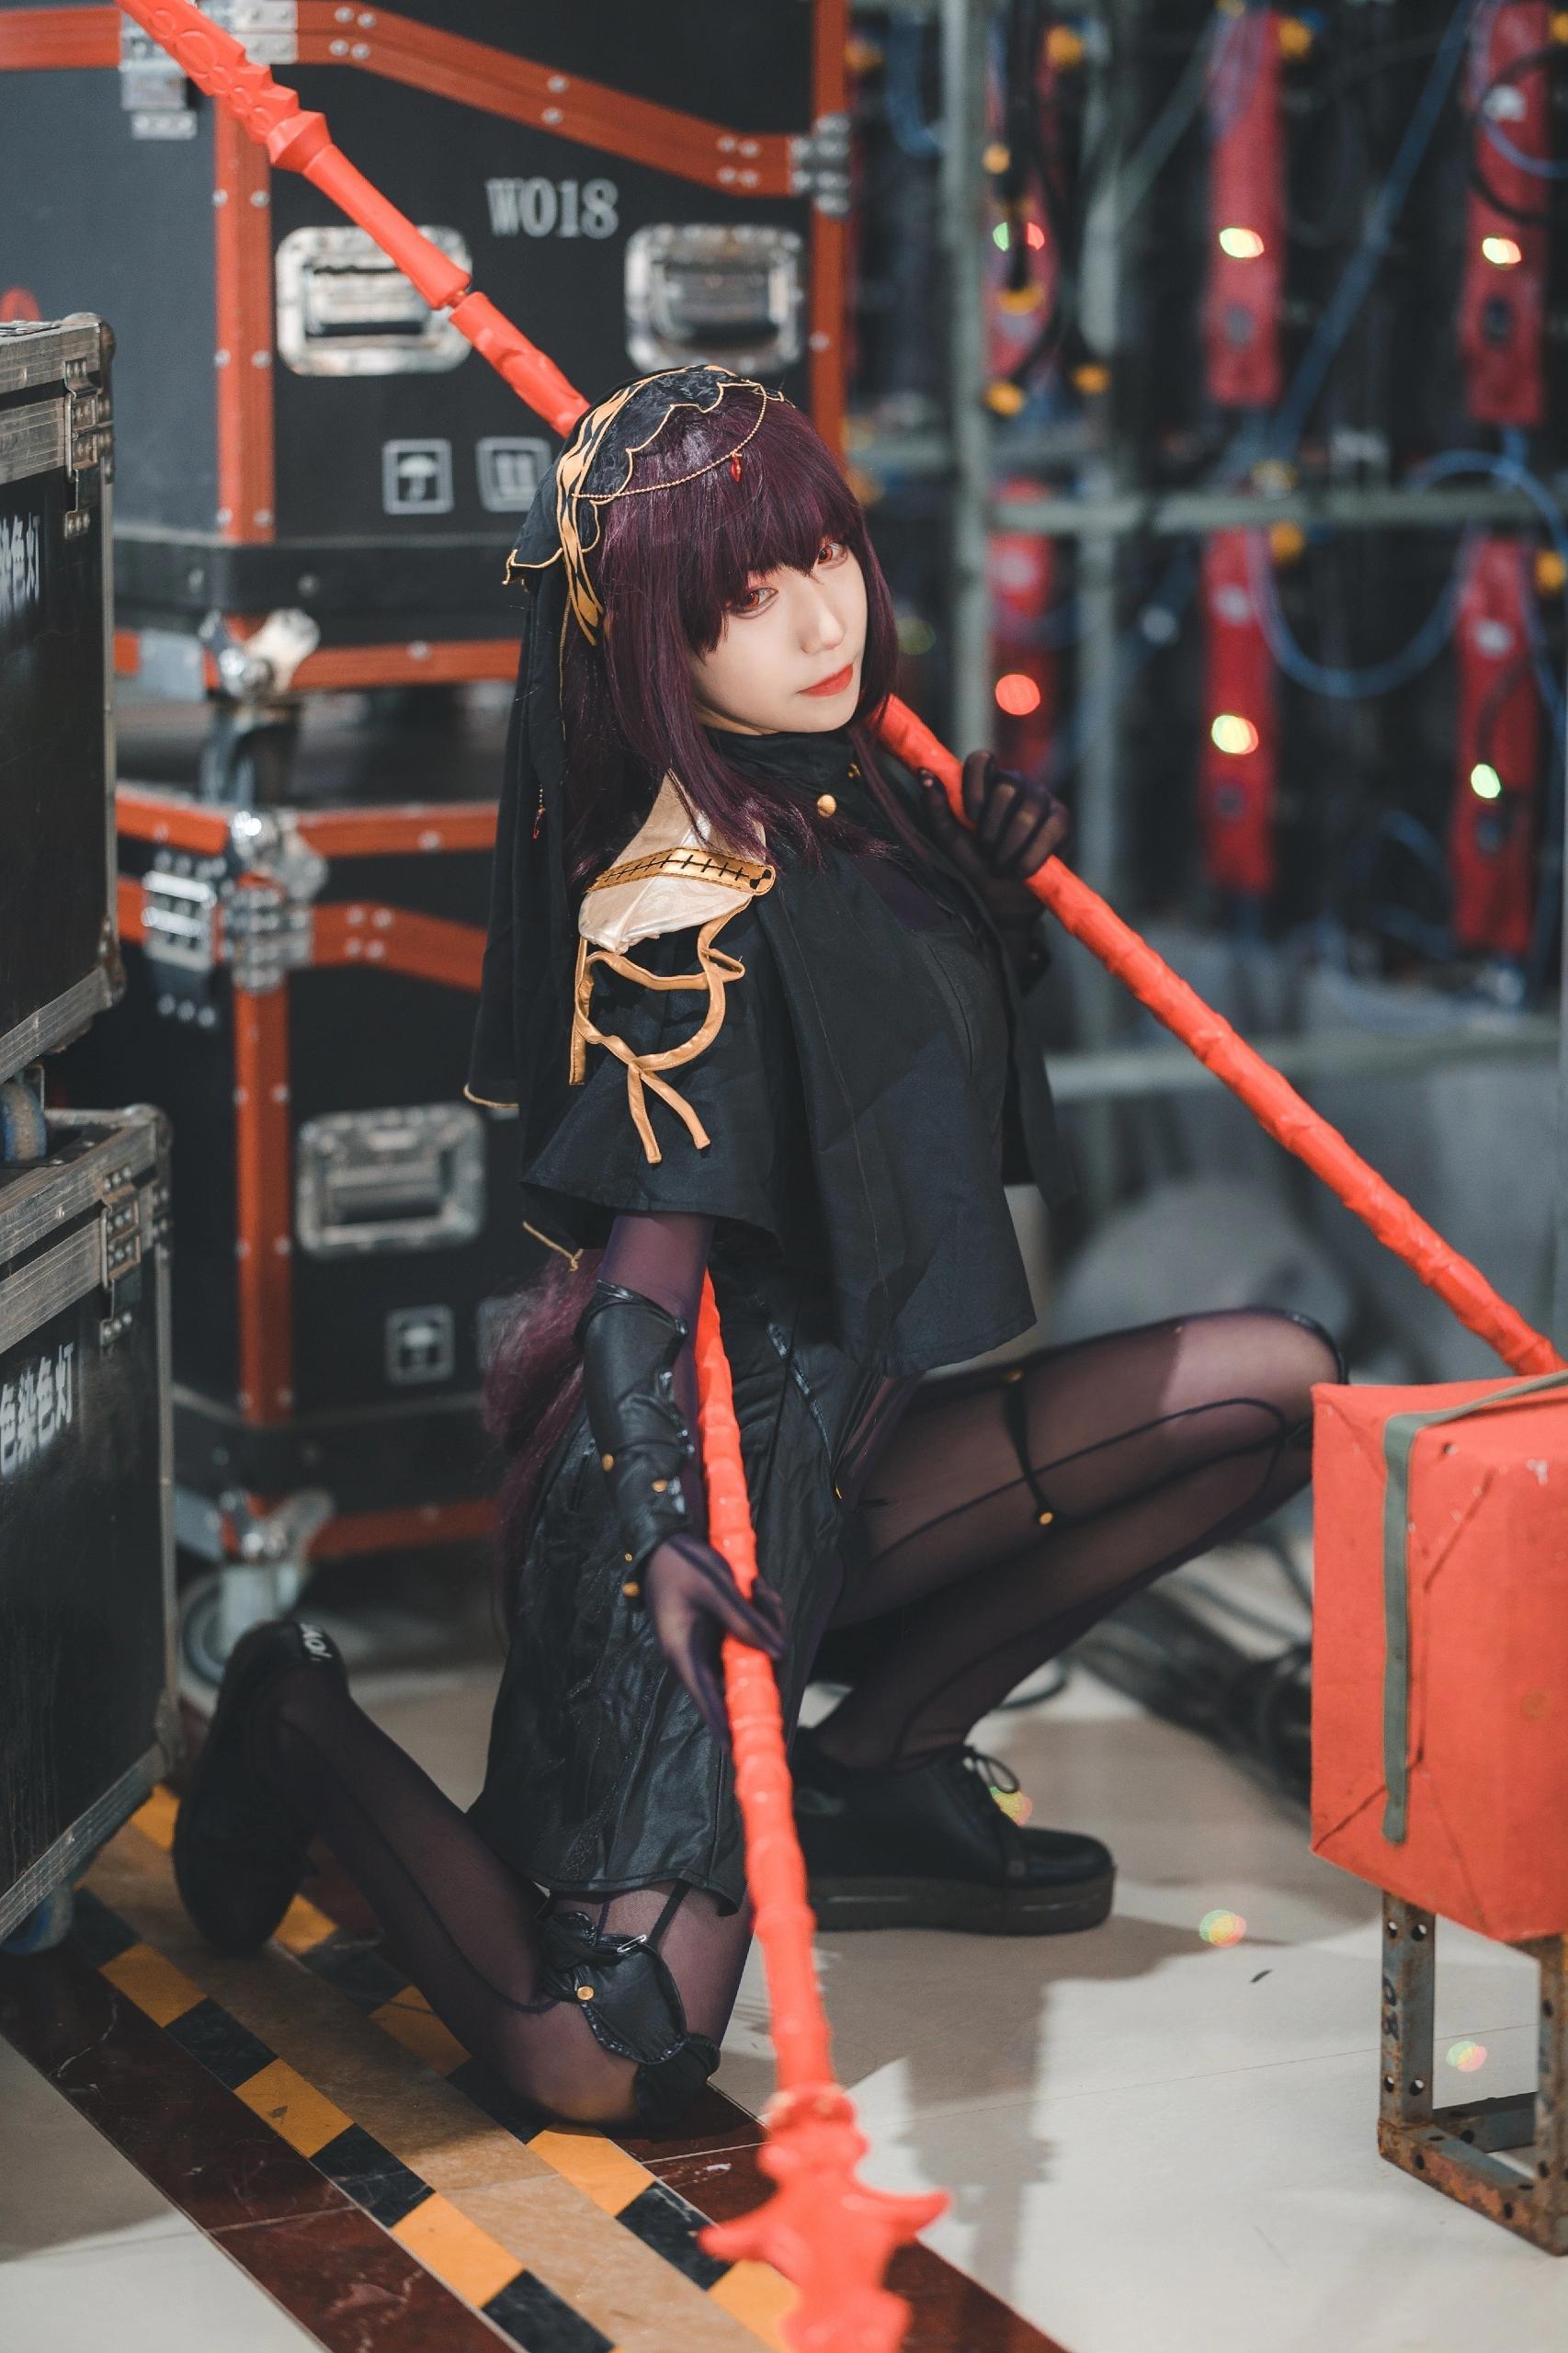 《FATE/GRAND ORDER》漫展cosplay【CN:COSER赤瞳_菌】-第4张